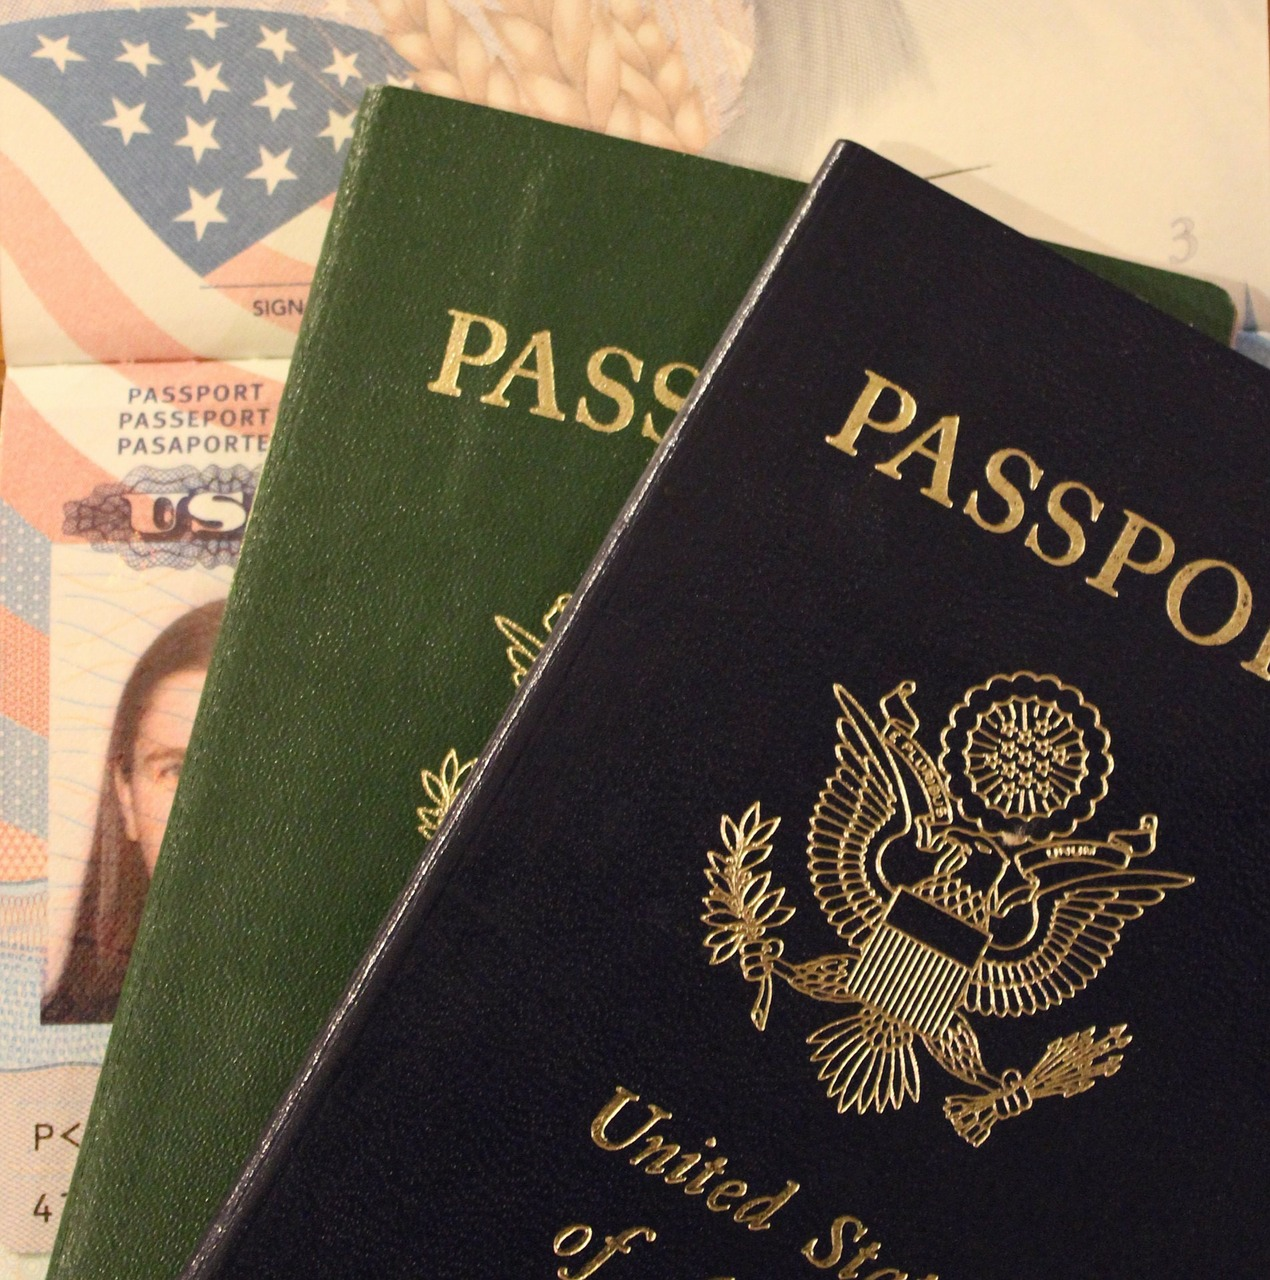 Guárdalo igual que a tu vida, tu pasaporte siempre debe ir contigo en tus maletas de viaje